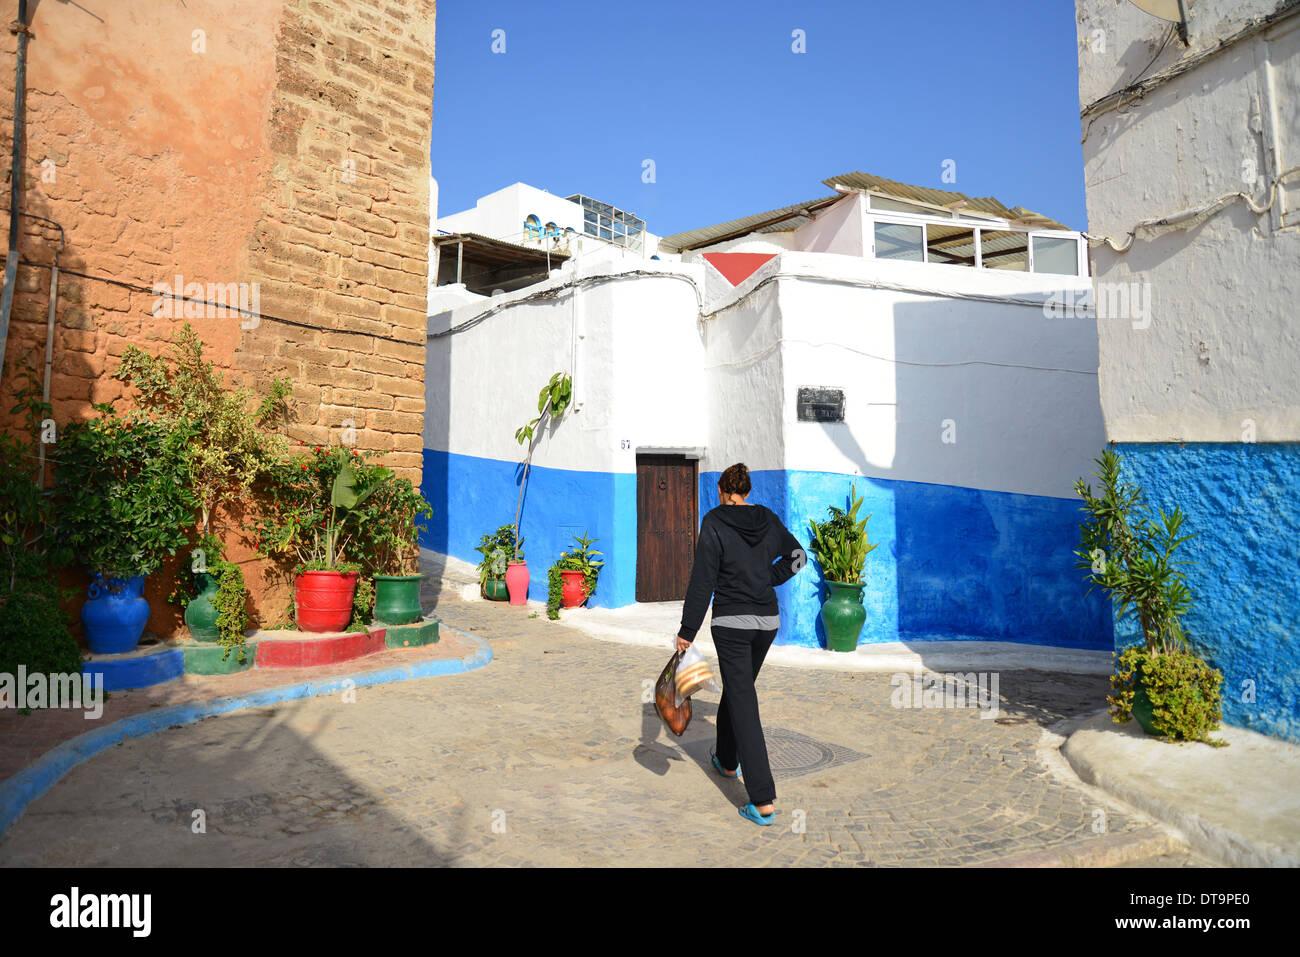 Colourful Houses In Kasbah Of The Udayas Qasbah Des Oudaya Rabat Stock Photo Royalty Free